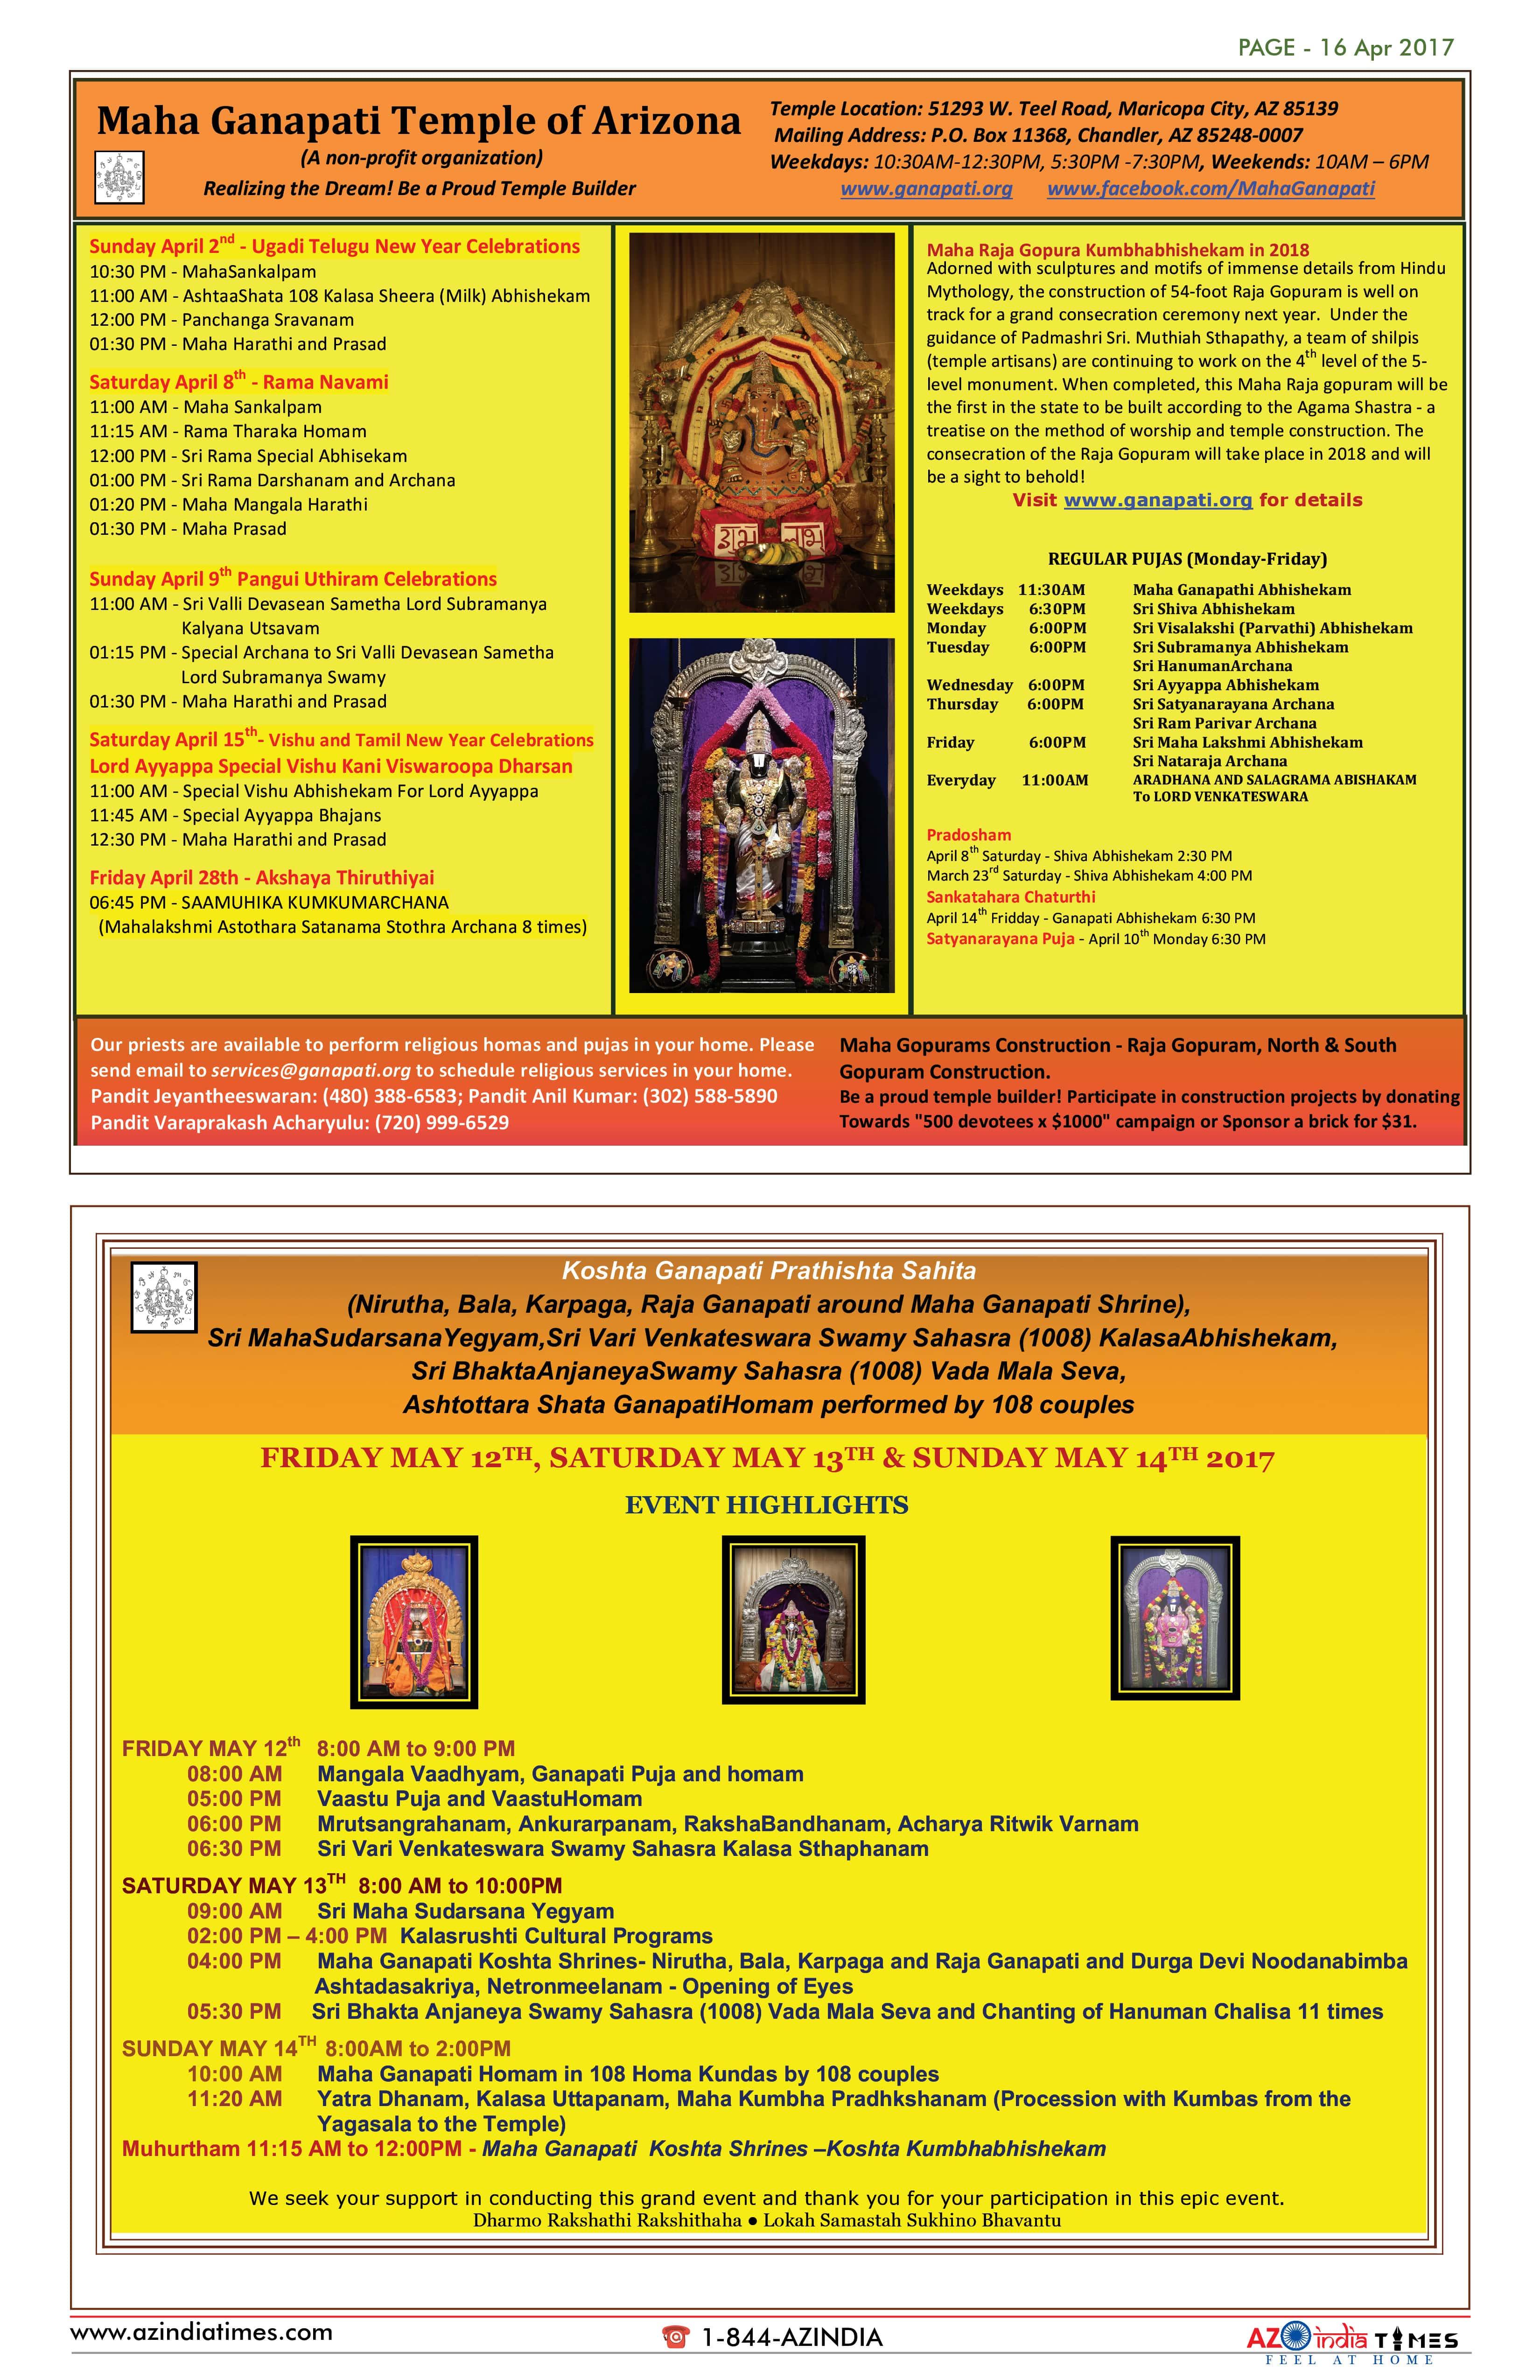 AZ INDIA APRIL EDITION-16